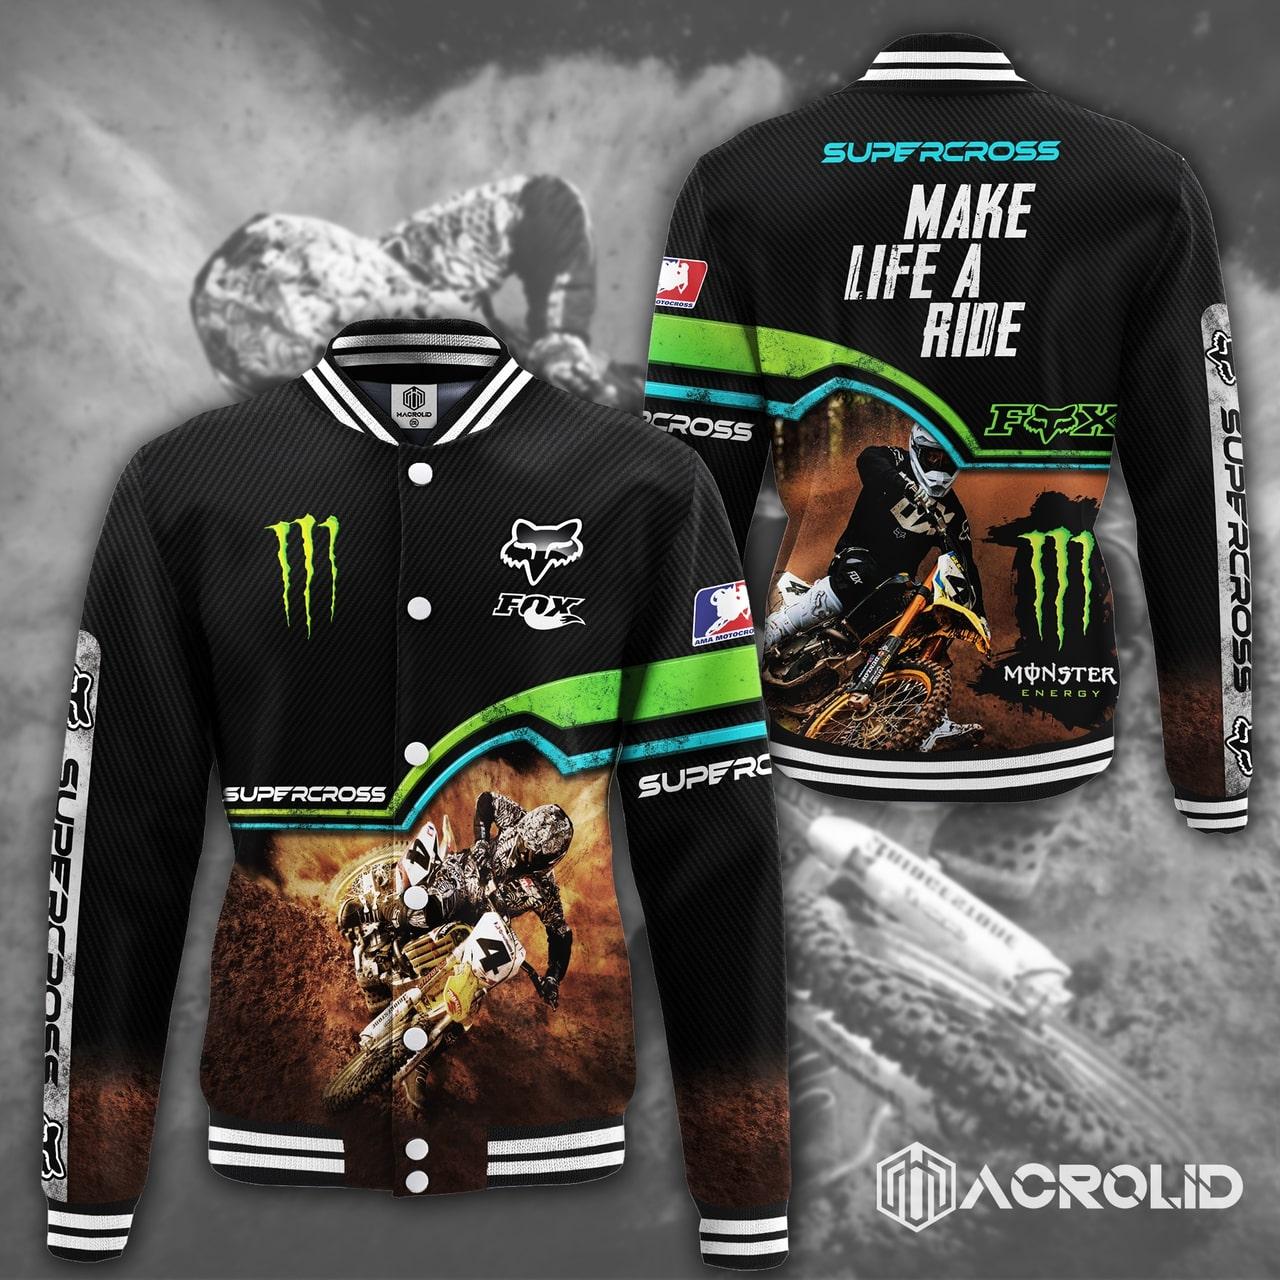 Fox racing monster energy make life a ride full printing baseball jacket